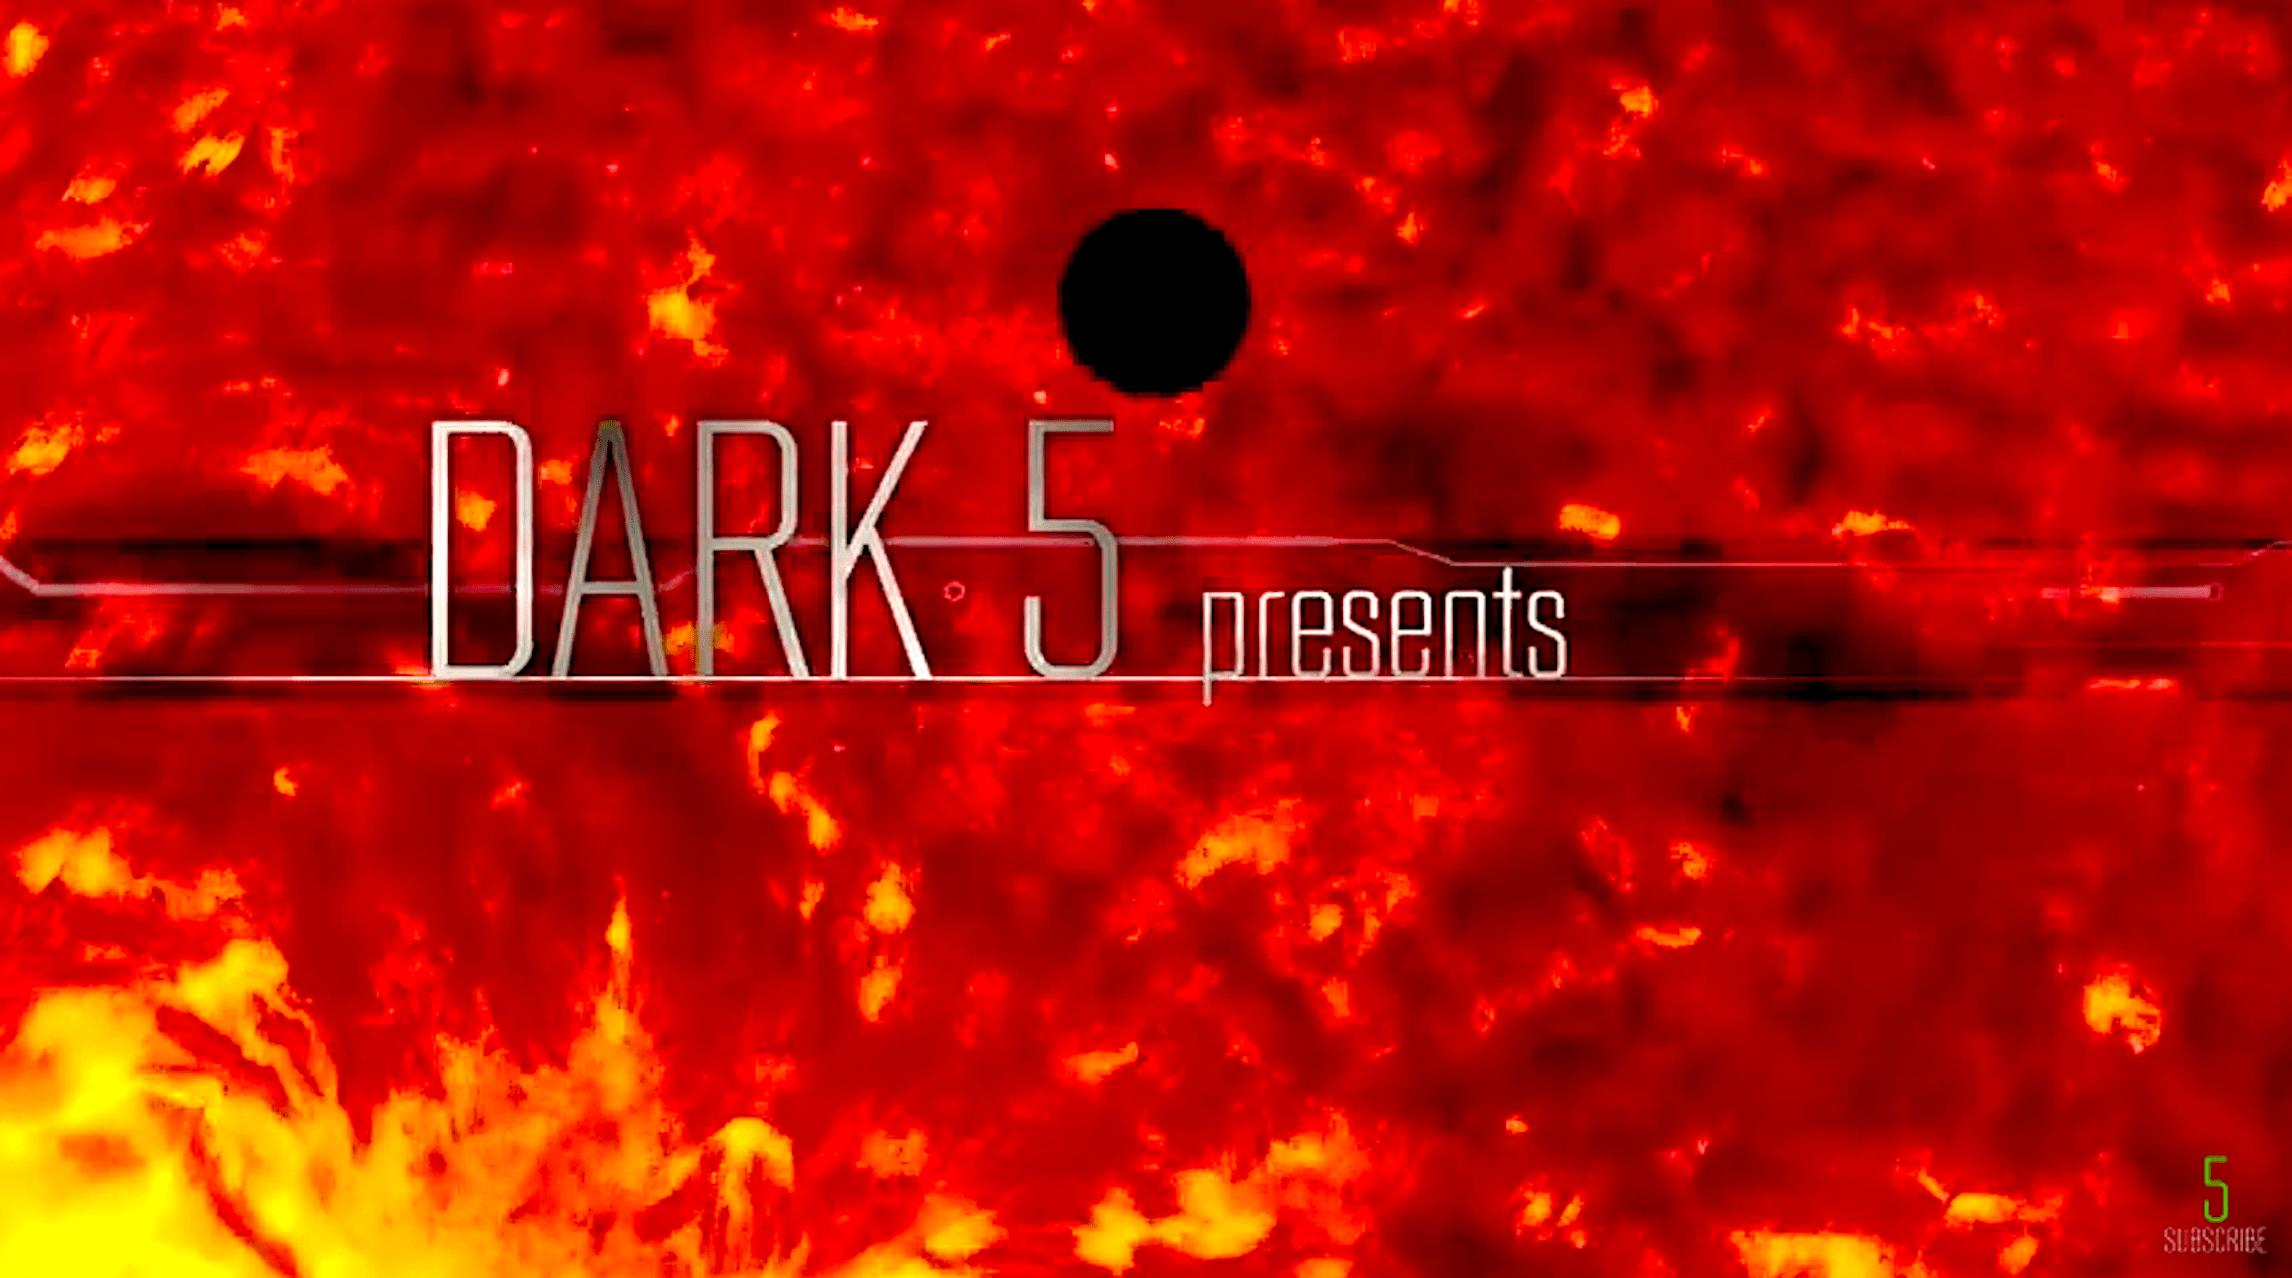 Dark5 presents